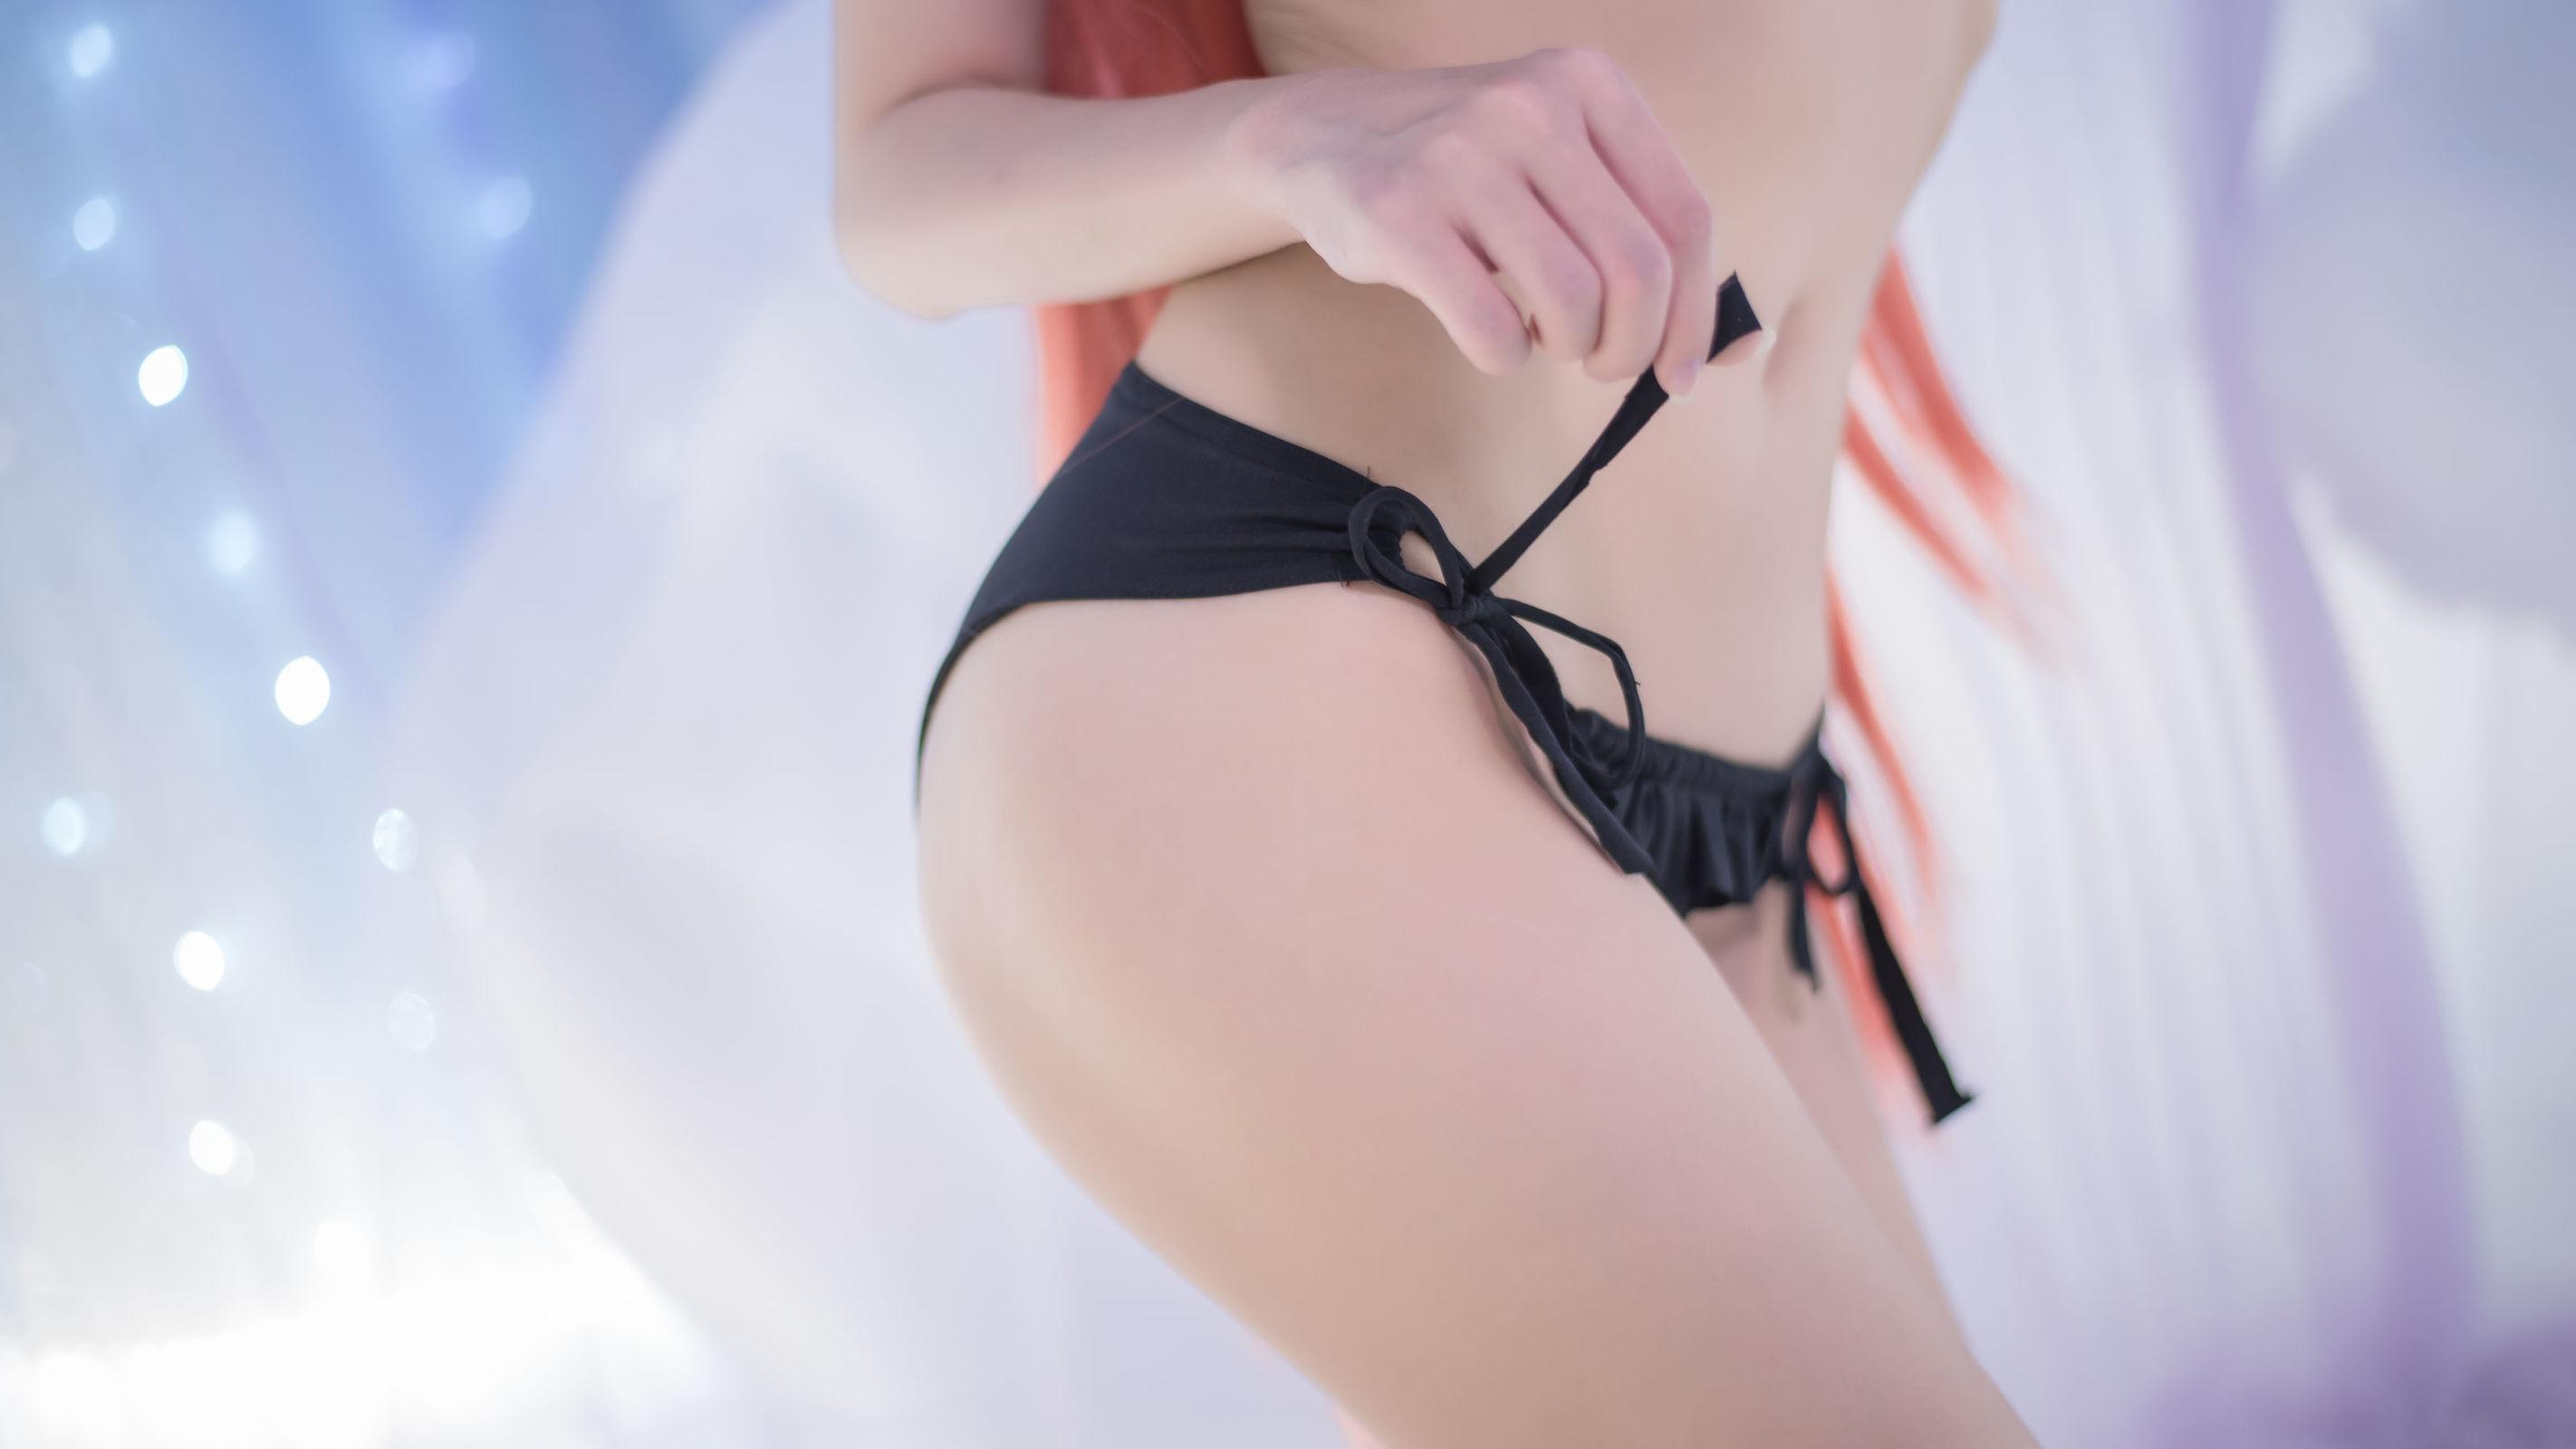 [CosPlay美女] 鳗鱼霏儿 - 红发魔女 [20P]